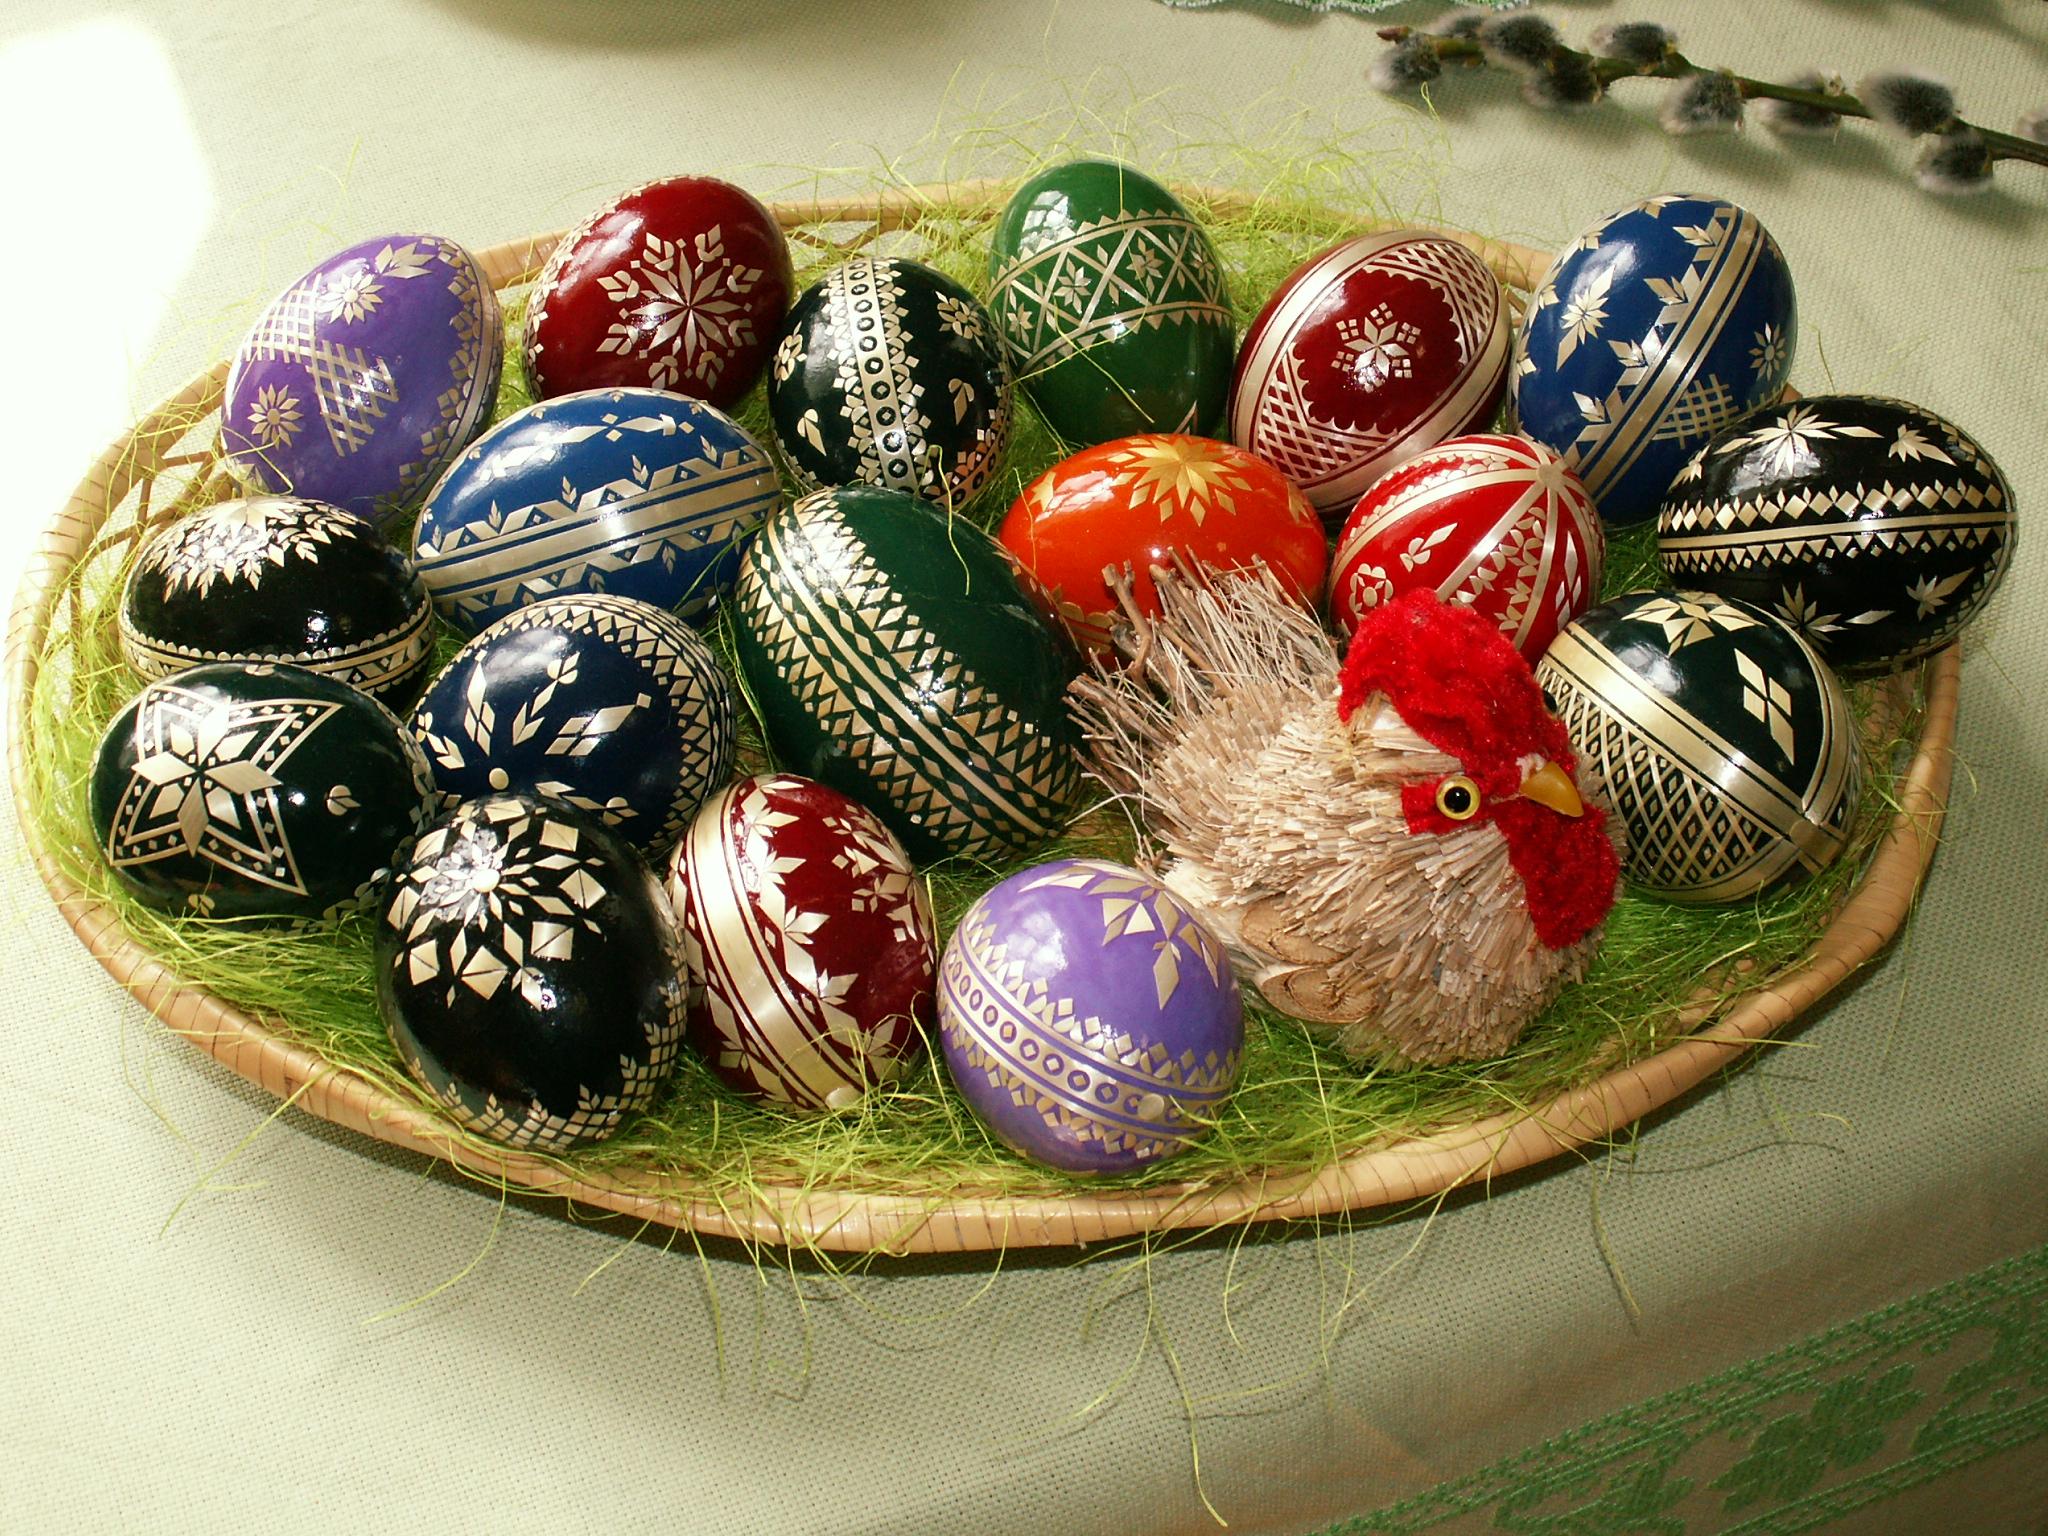 Fun Easter Activities for under 10s